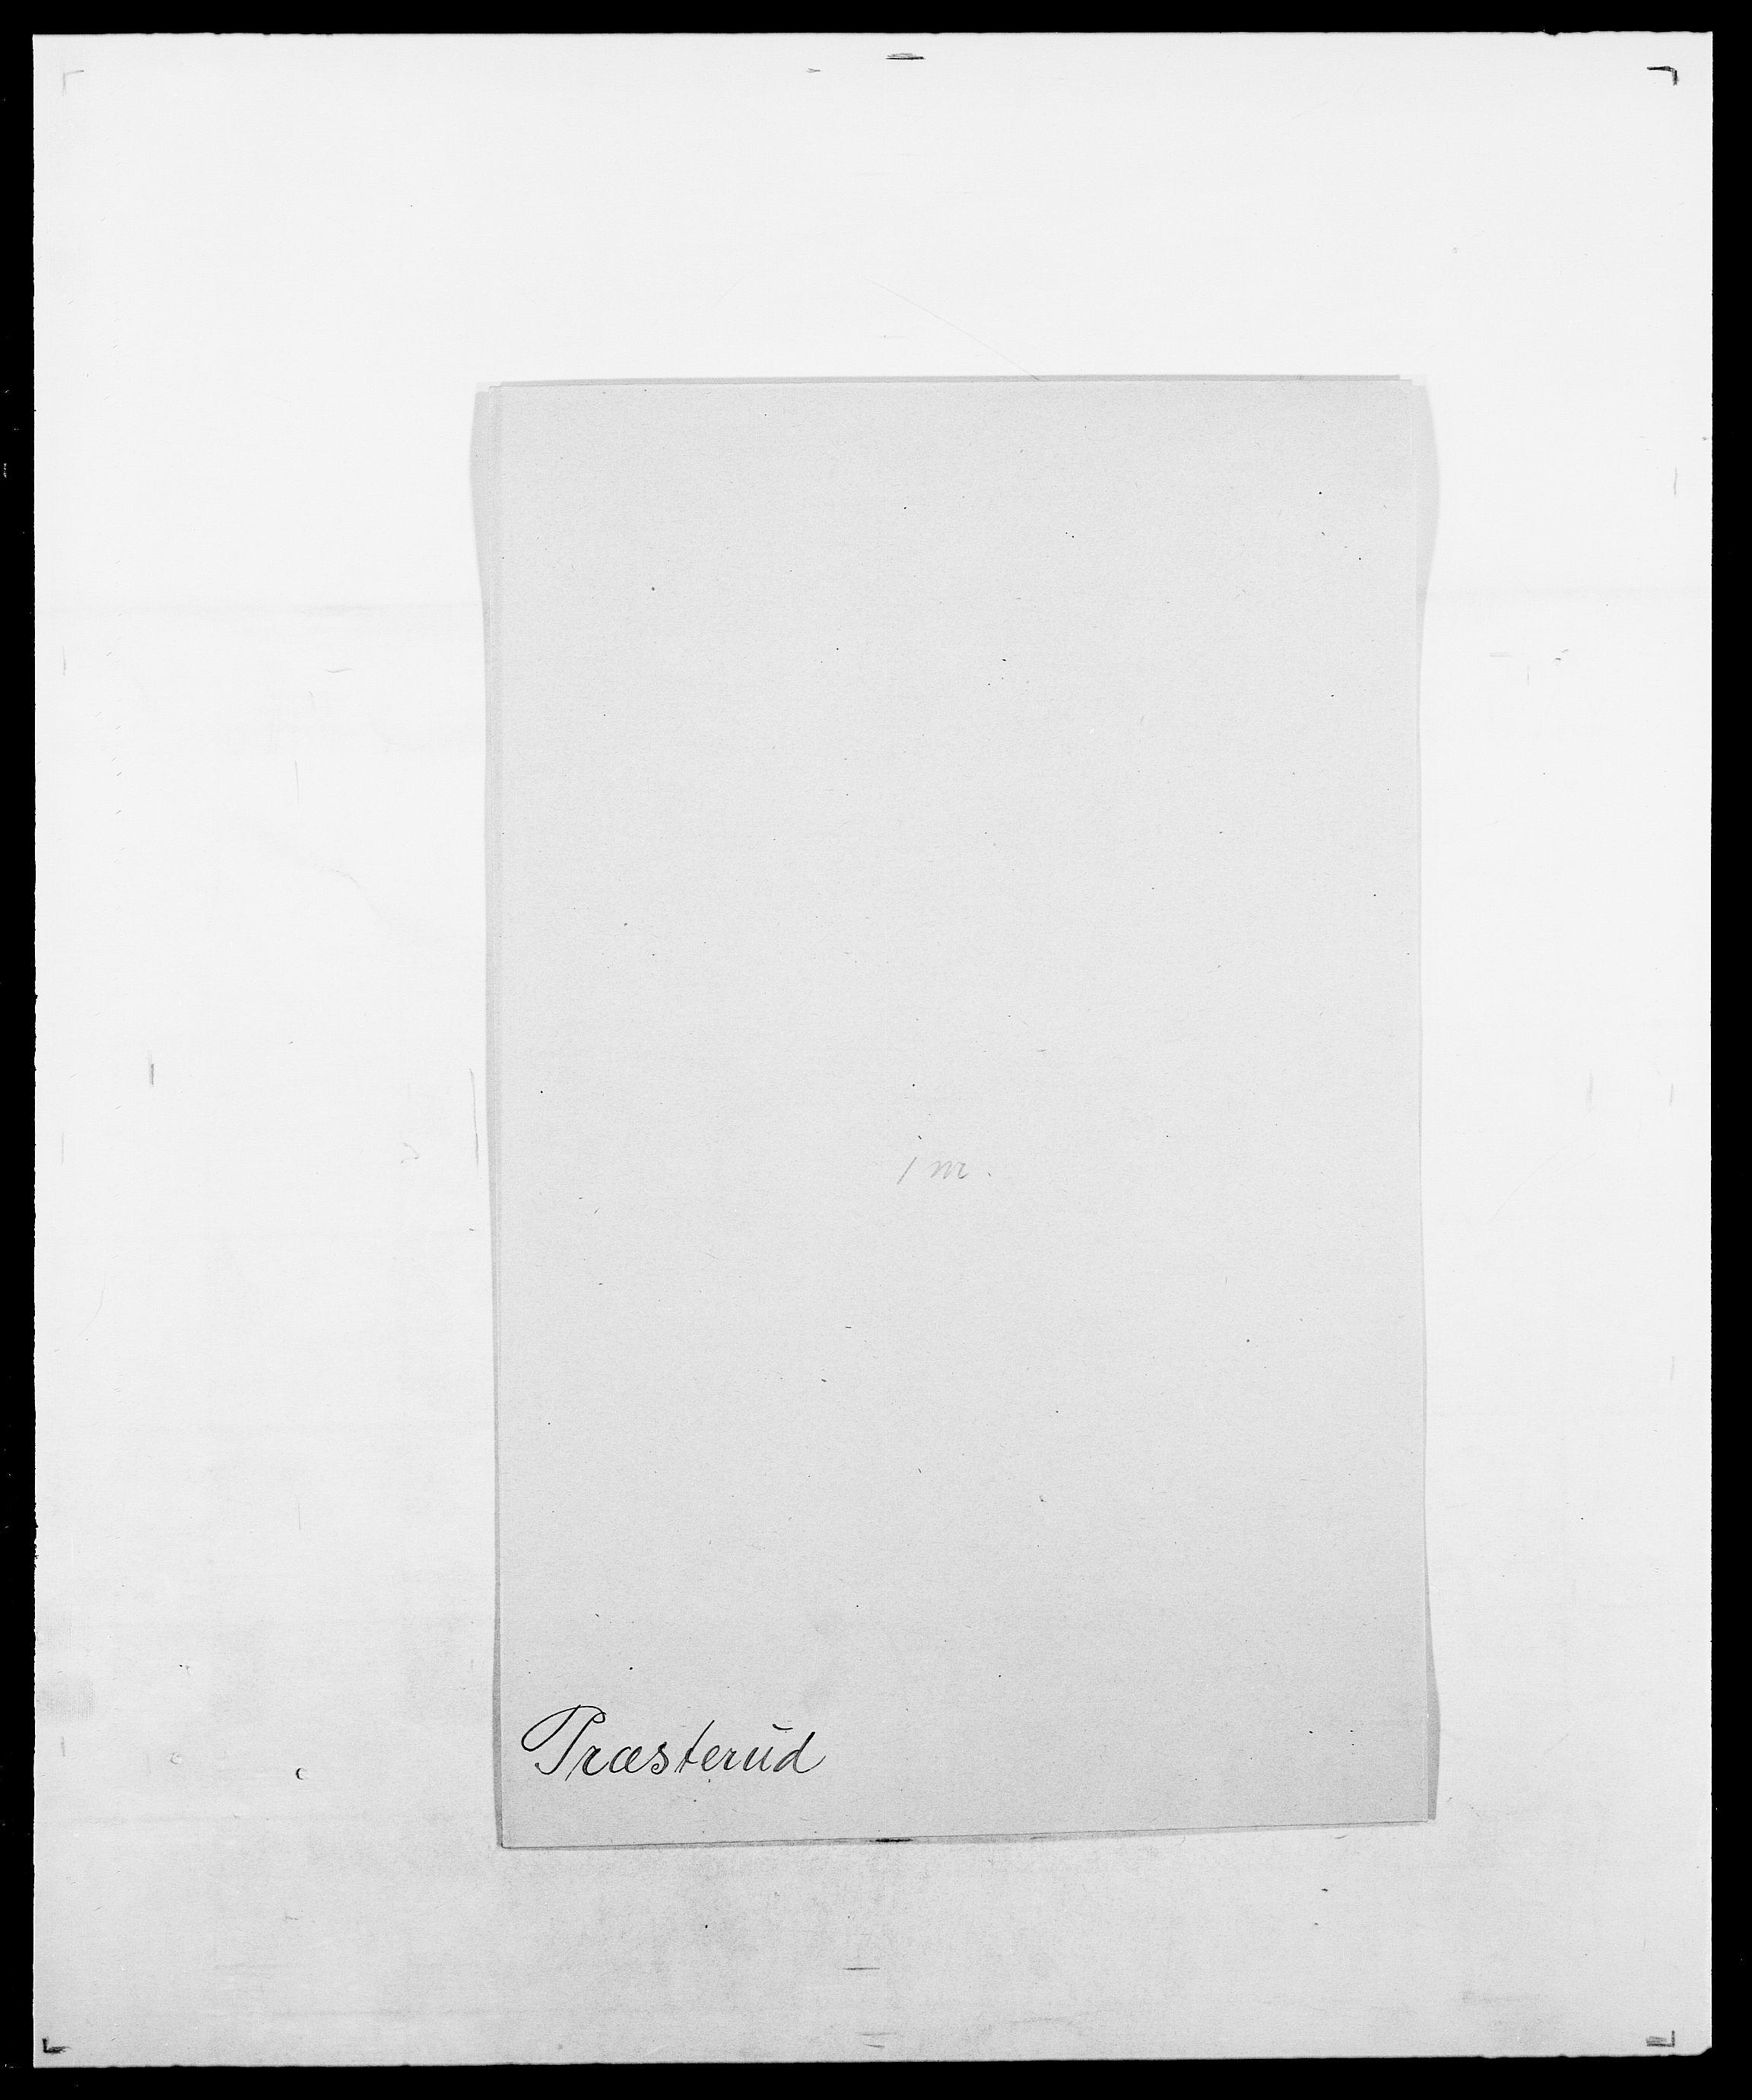 SAO, Delgobe, Charles Antoine - samling, D/Da/L0031: de Place - Raaum, s. 402